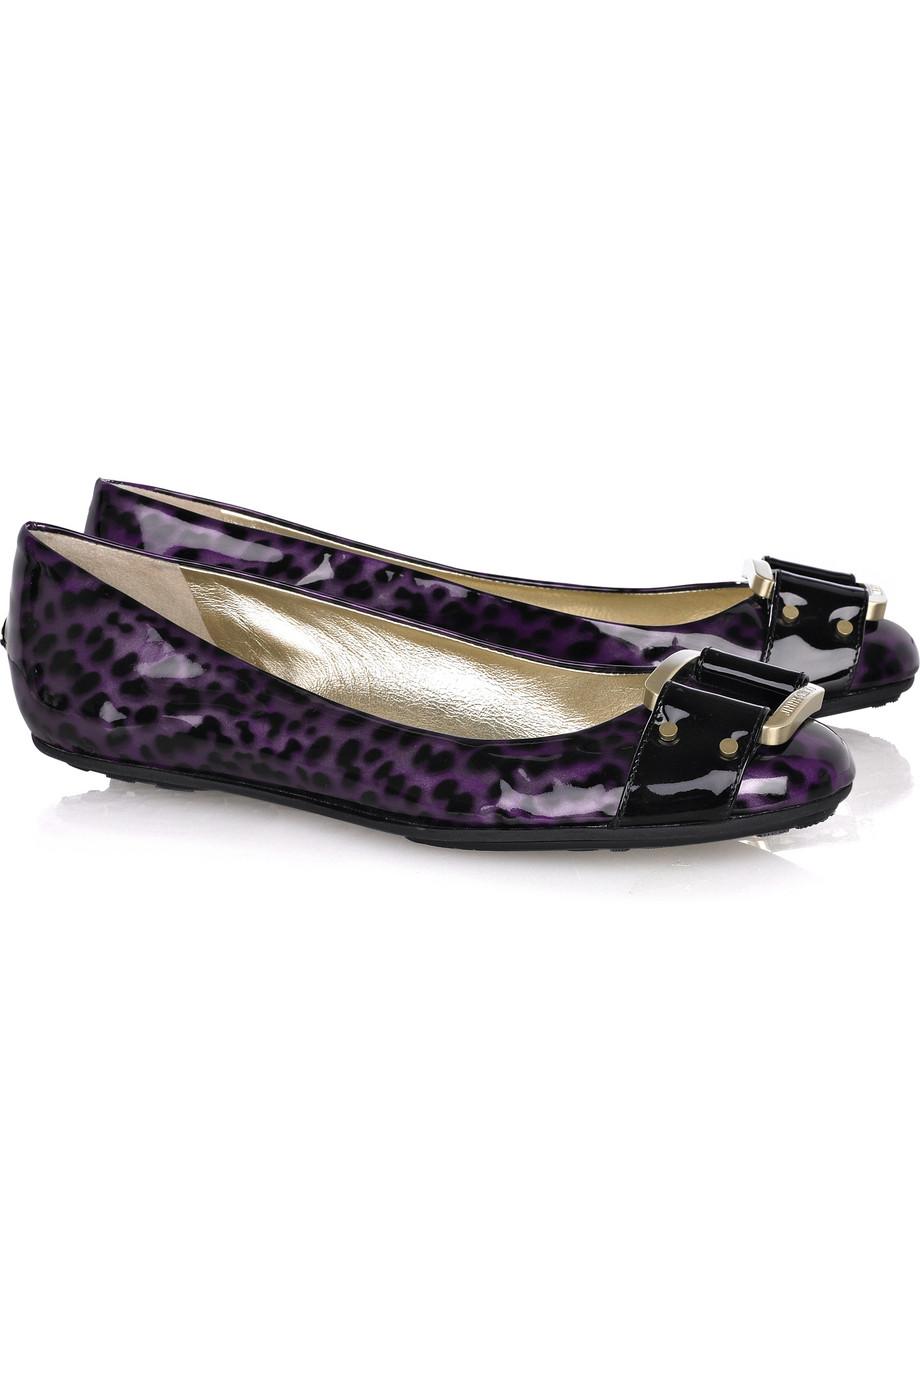 jimmy choo morse patent leather ballerina flats in purple lyst. Black Bedroom Furniture Sets. Home Design Ideas